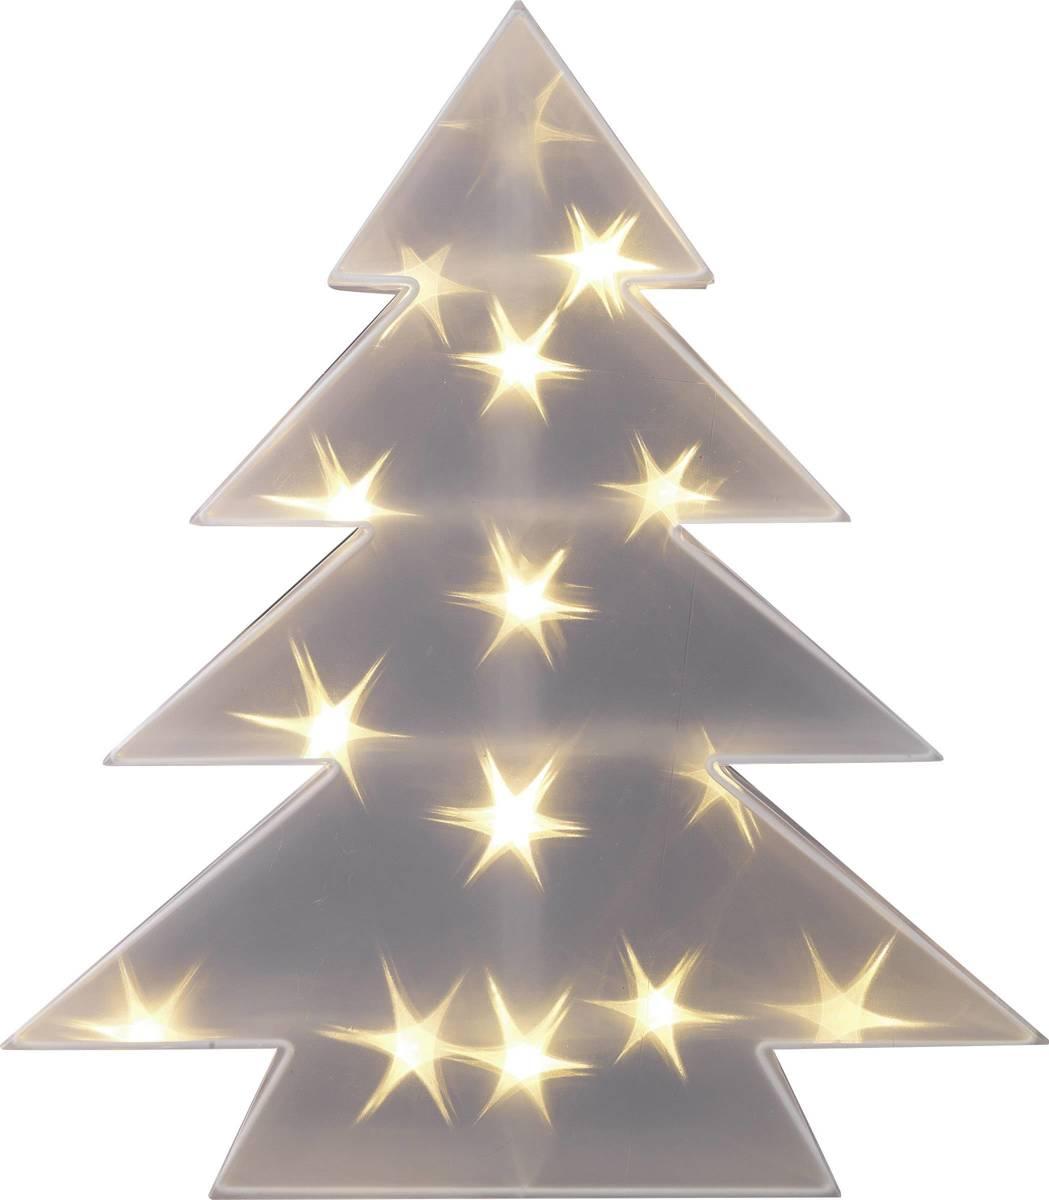 LED-kerstdecoratie Kerstboom Warm-wit LED Transparant Polarlite LDE-04-001 kopen